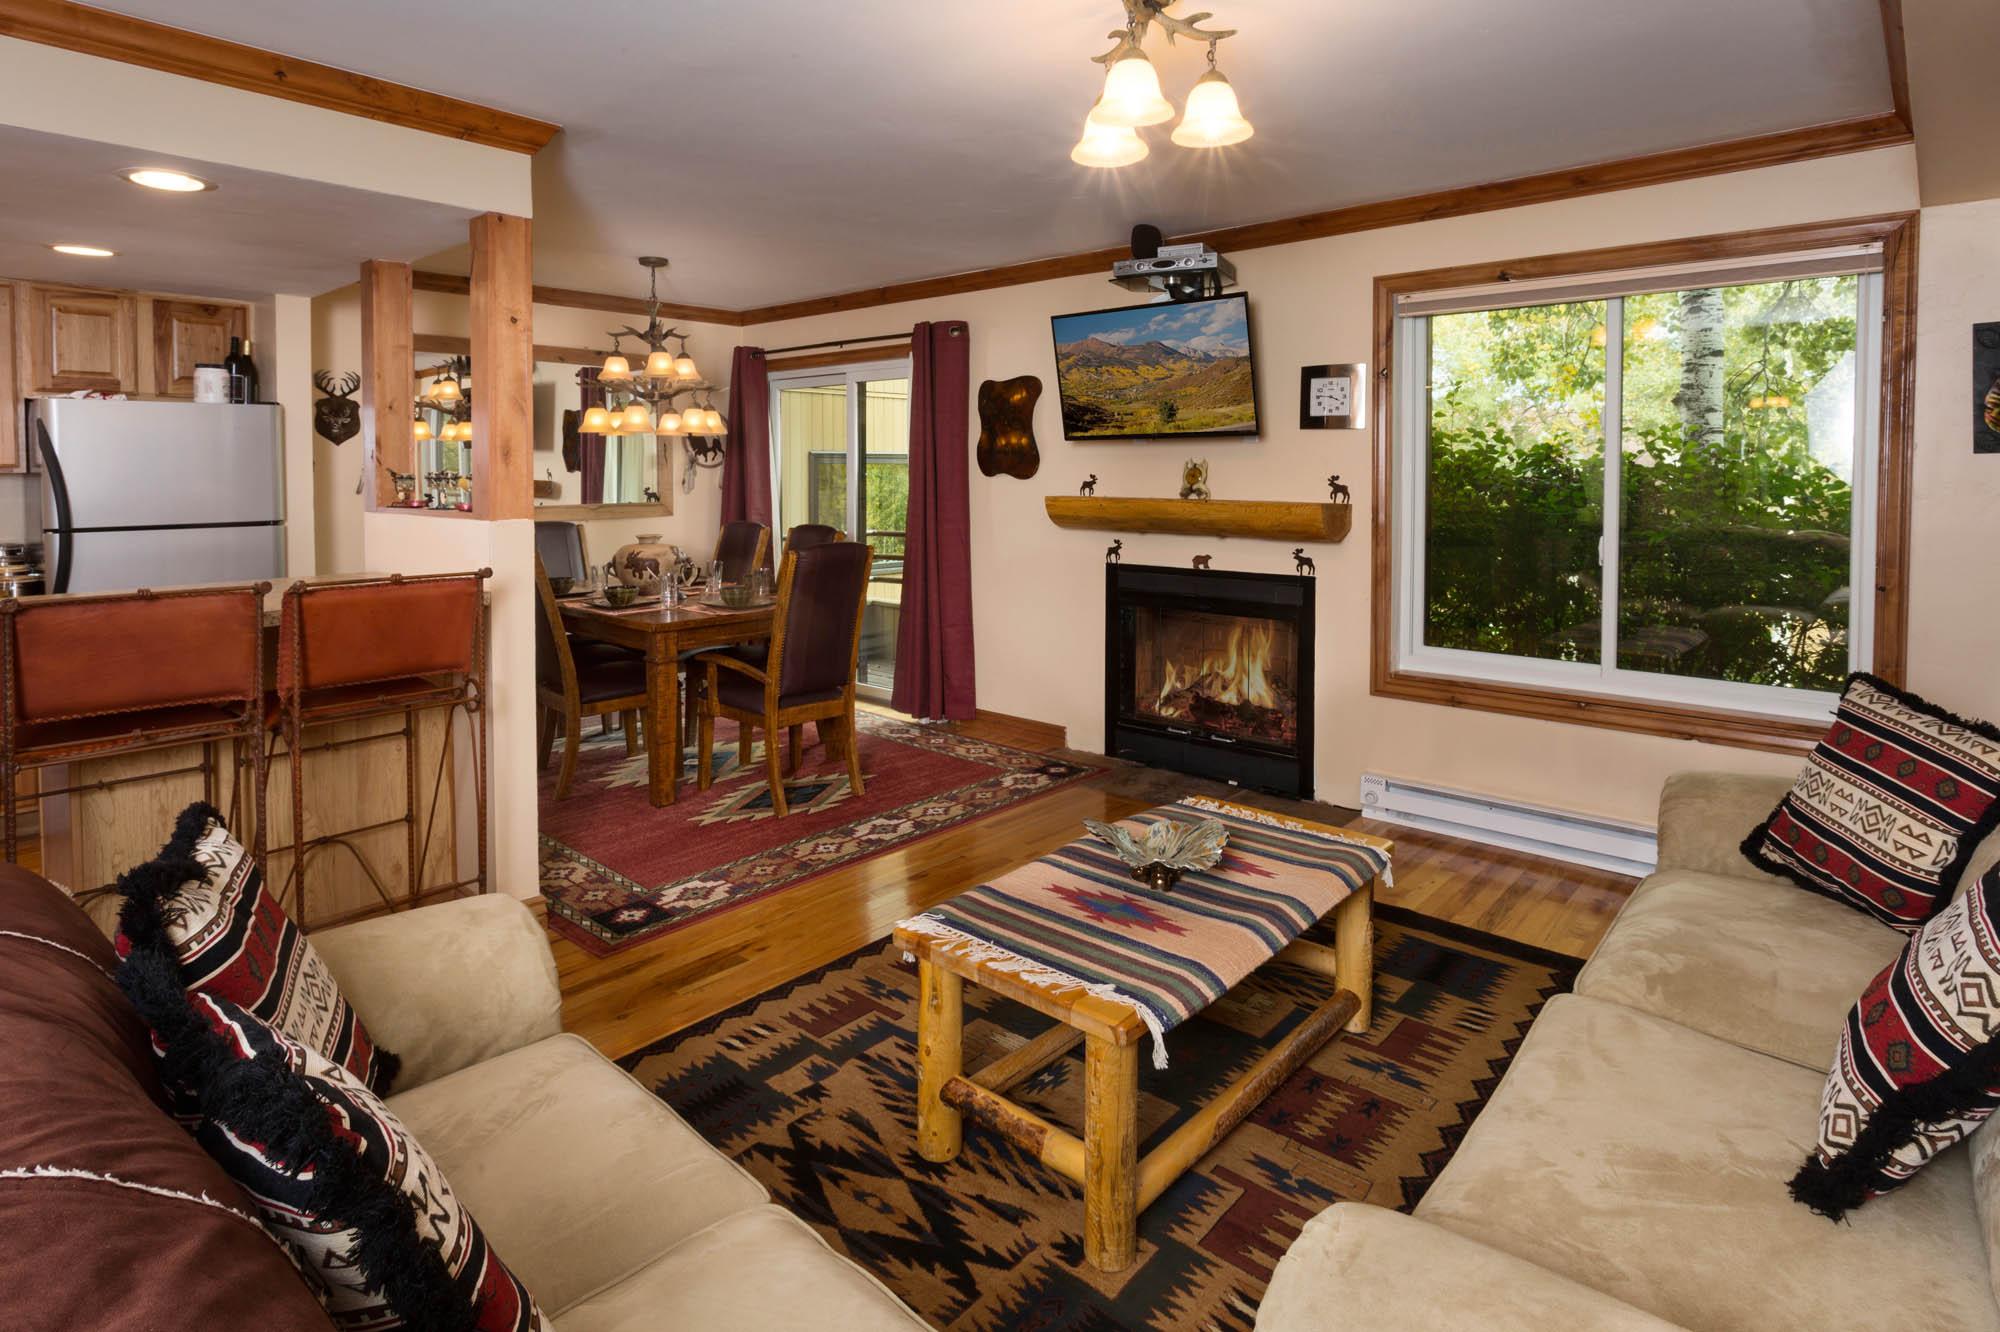 Condominium for Sale at Seasons 4 Unit: 193 55 Lower Woodbridge Road Unit #193 Snowmass Village, Colorado 81615 United States